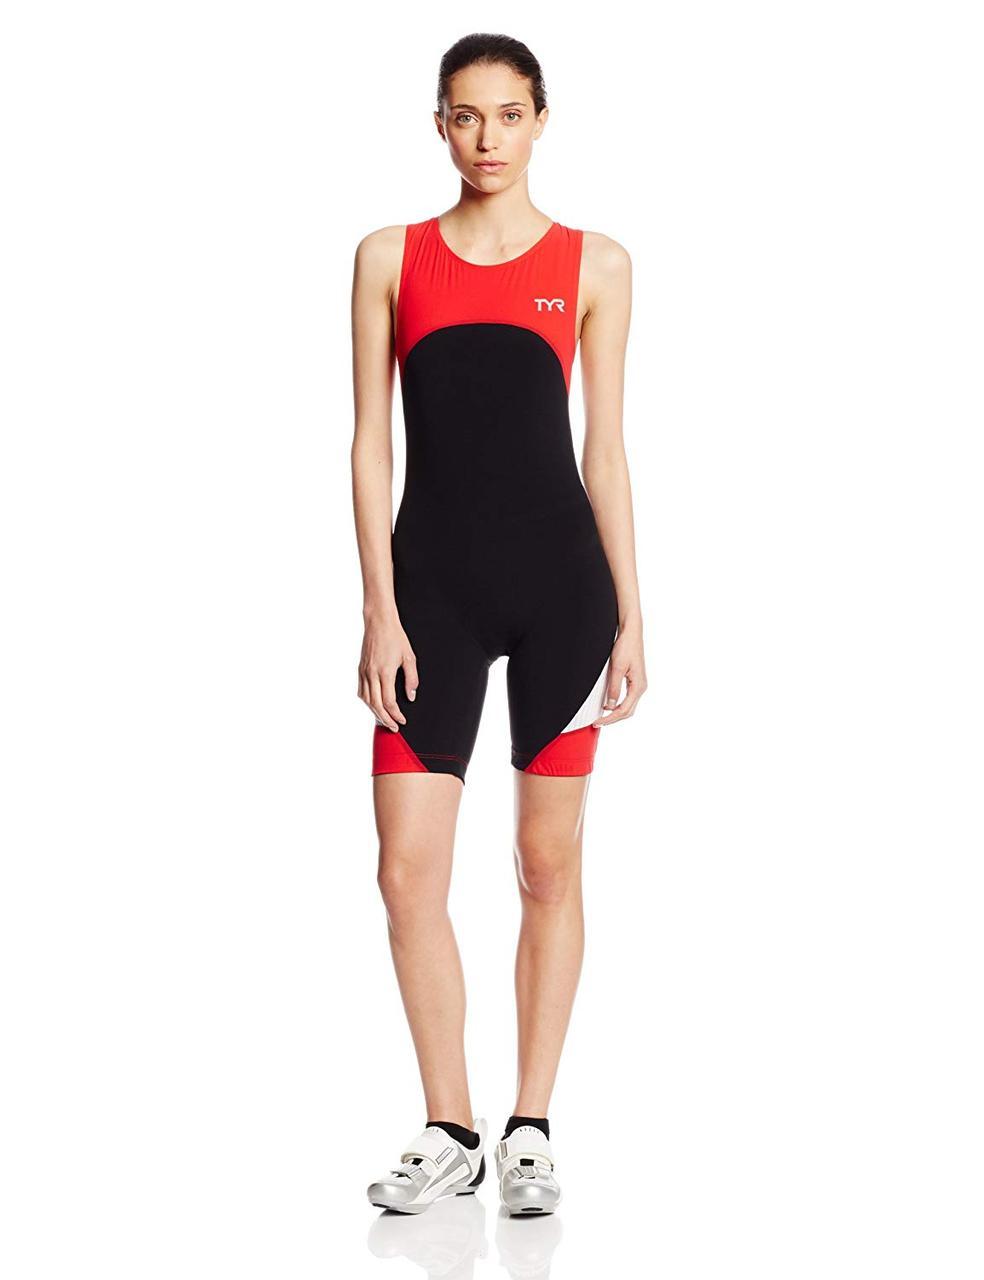 Стартовый костюм без рукавов с молнией сзади TYR Women's Carbon Zipper Back Short John W/Pad